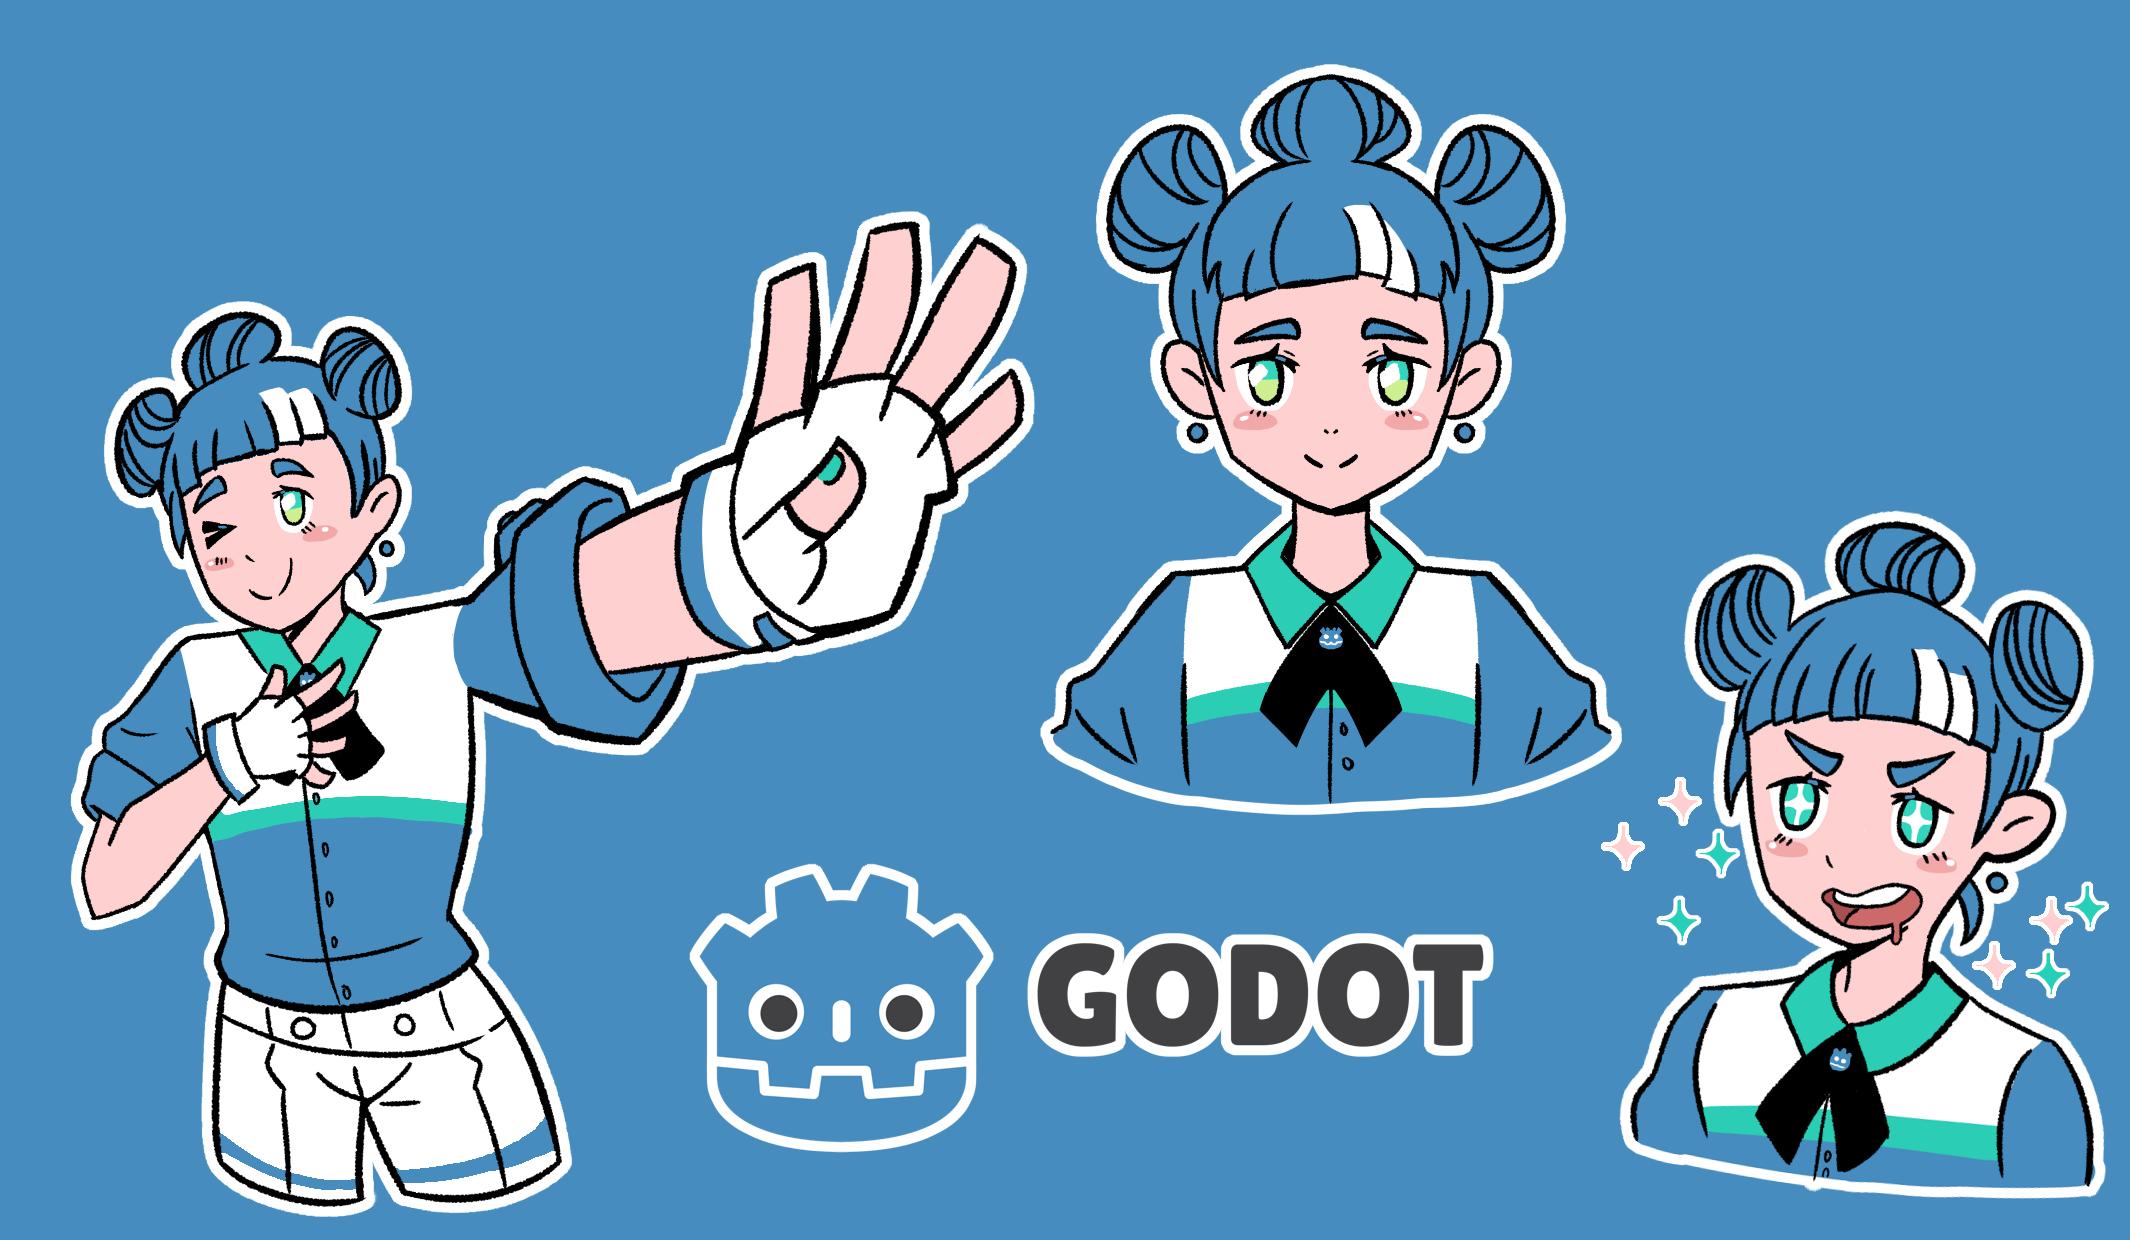 Godot Chan (Godot Game engine mascot) by DoniArts on Newgrounds